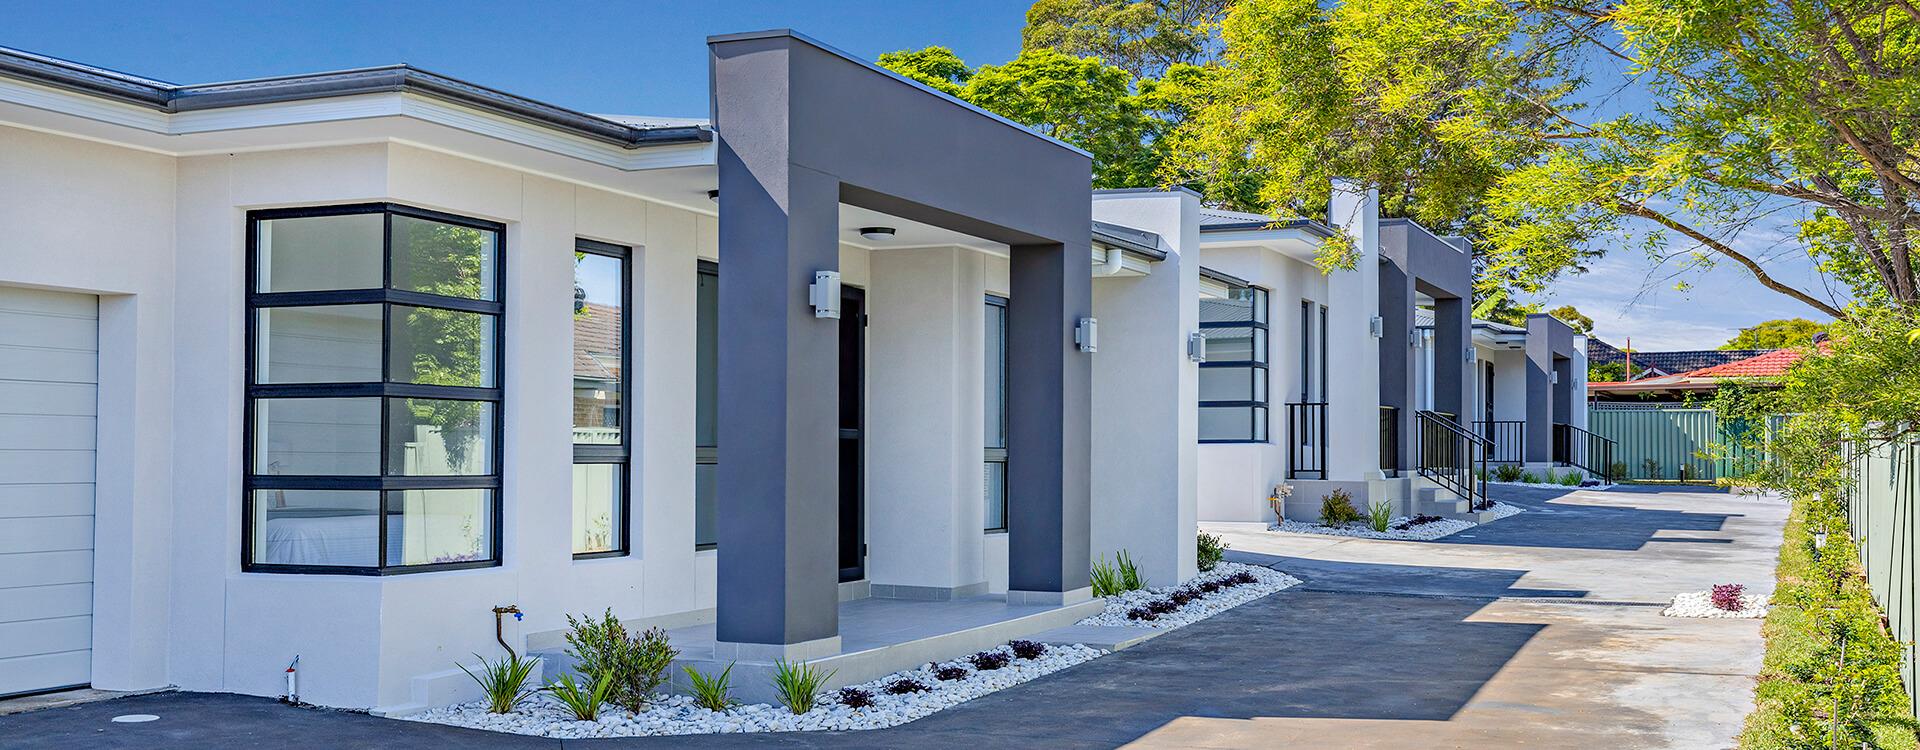 new_multi_dwelling - Astor Homes